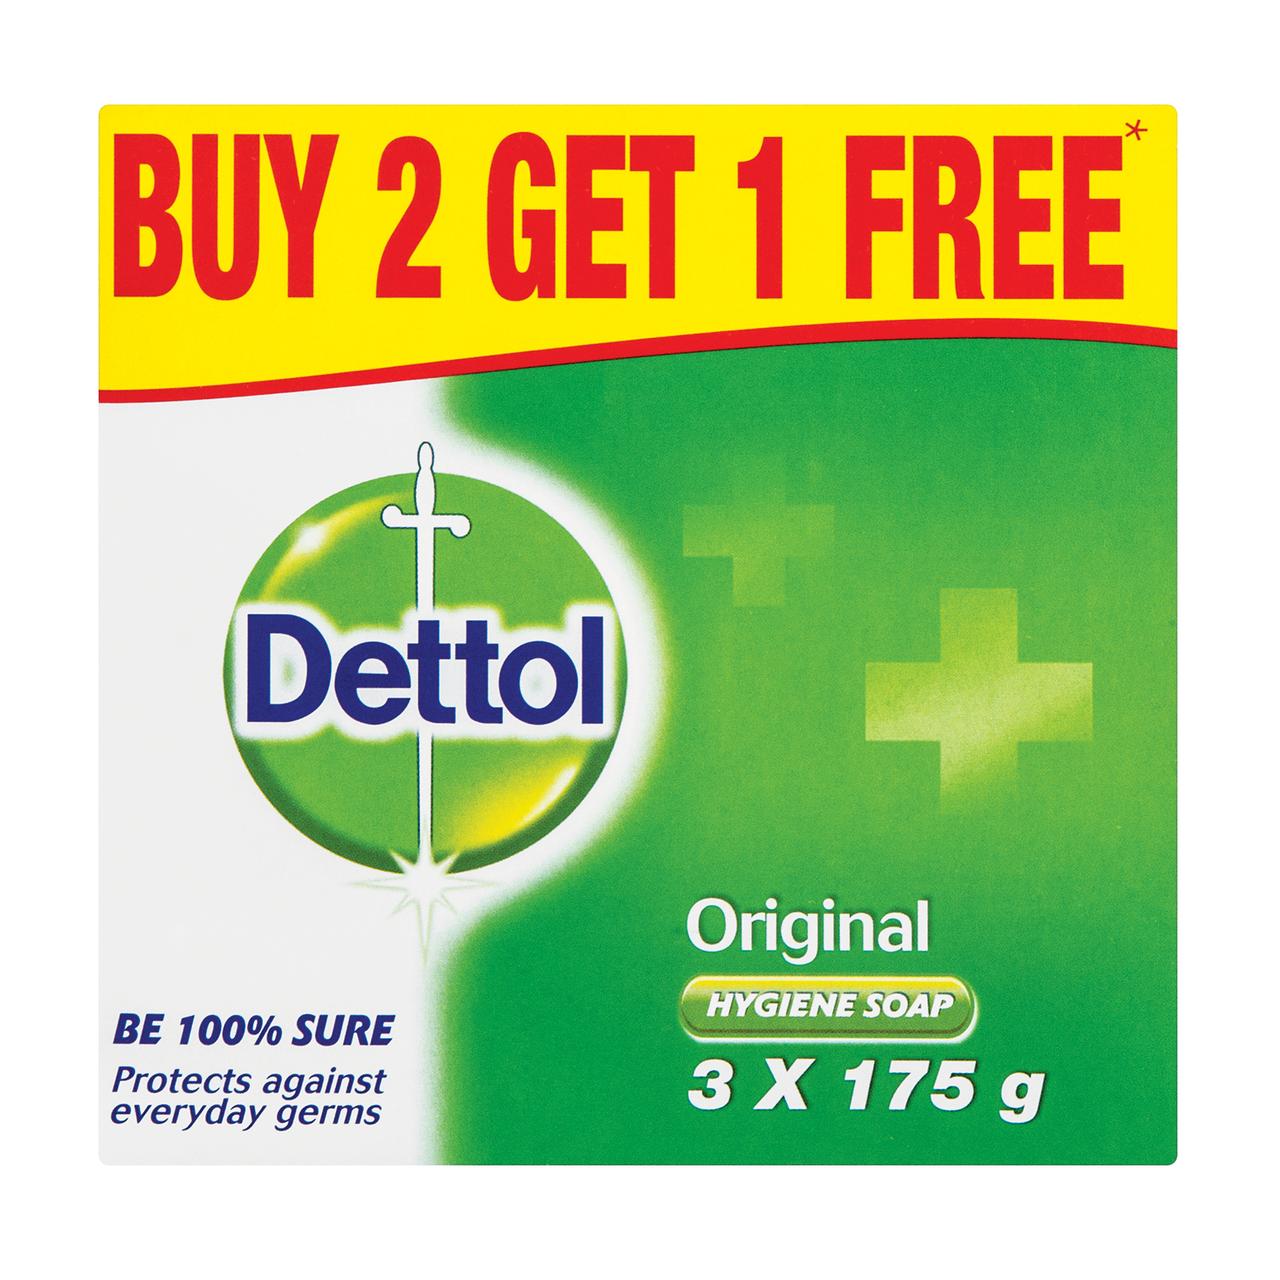 Dettol Hygiene Soap Original.